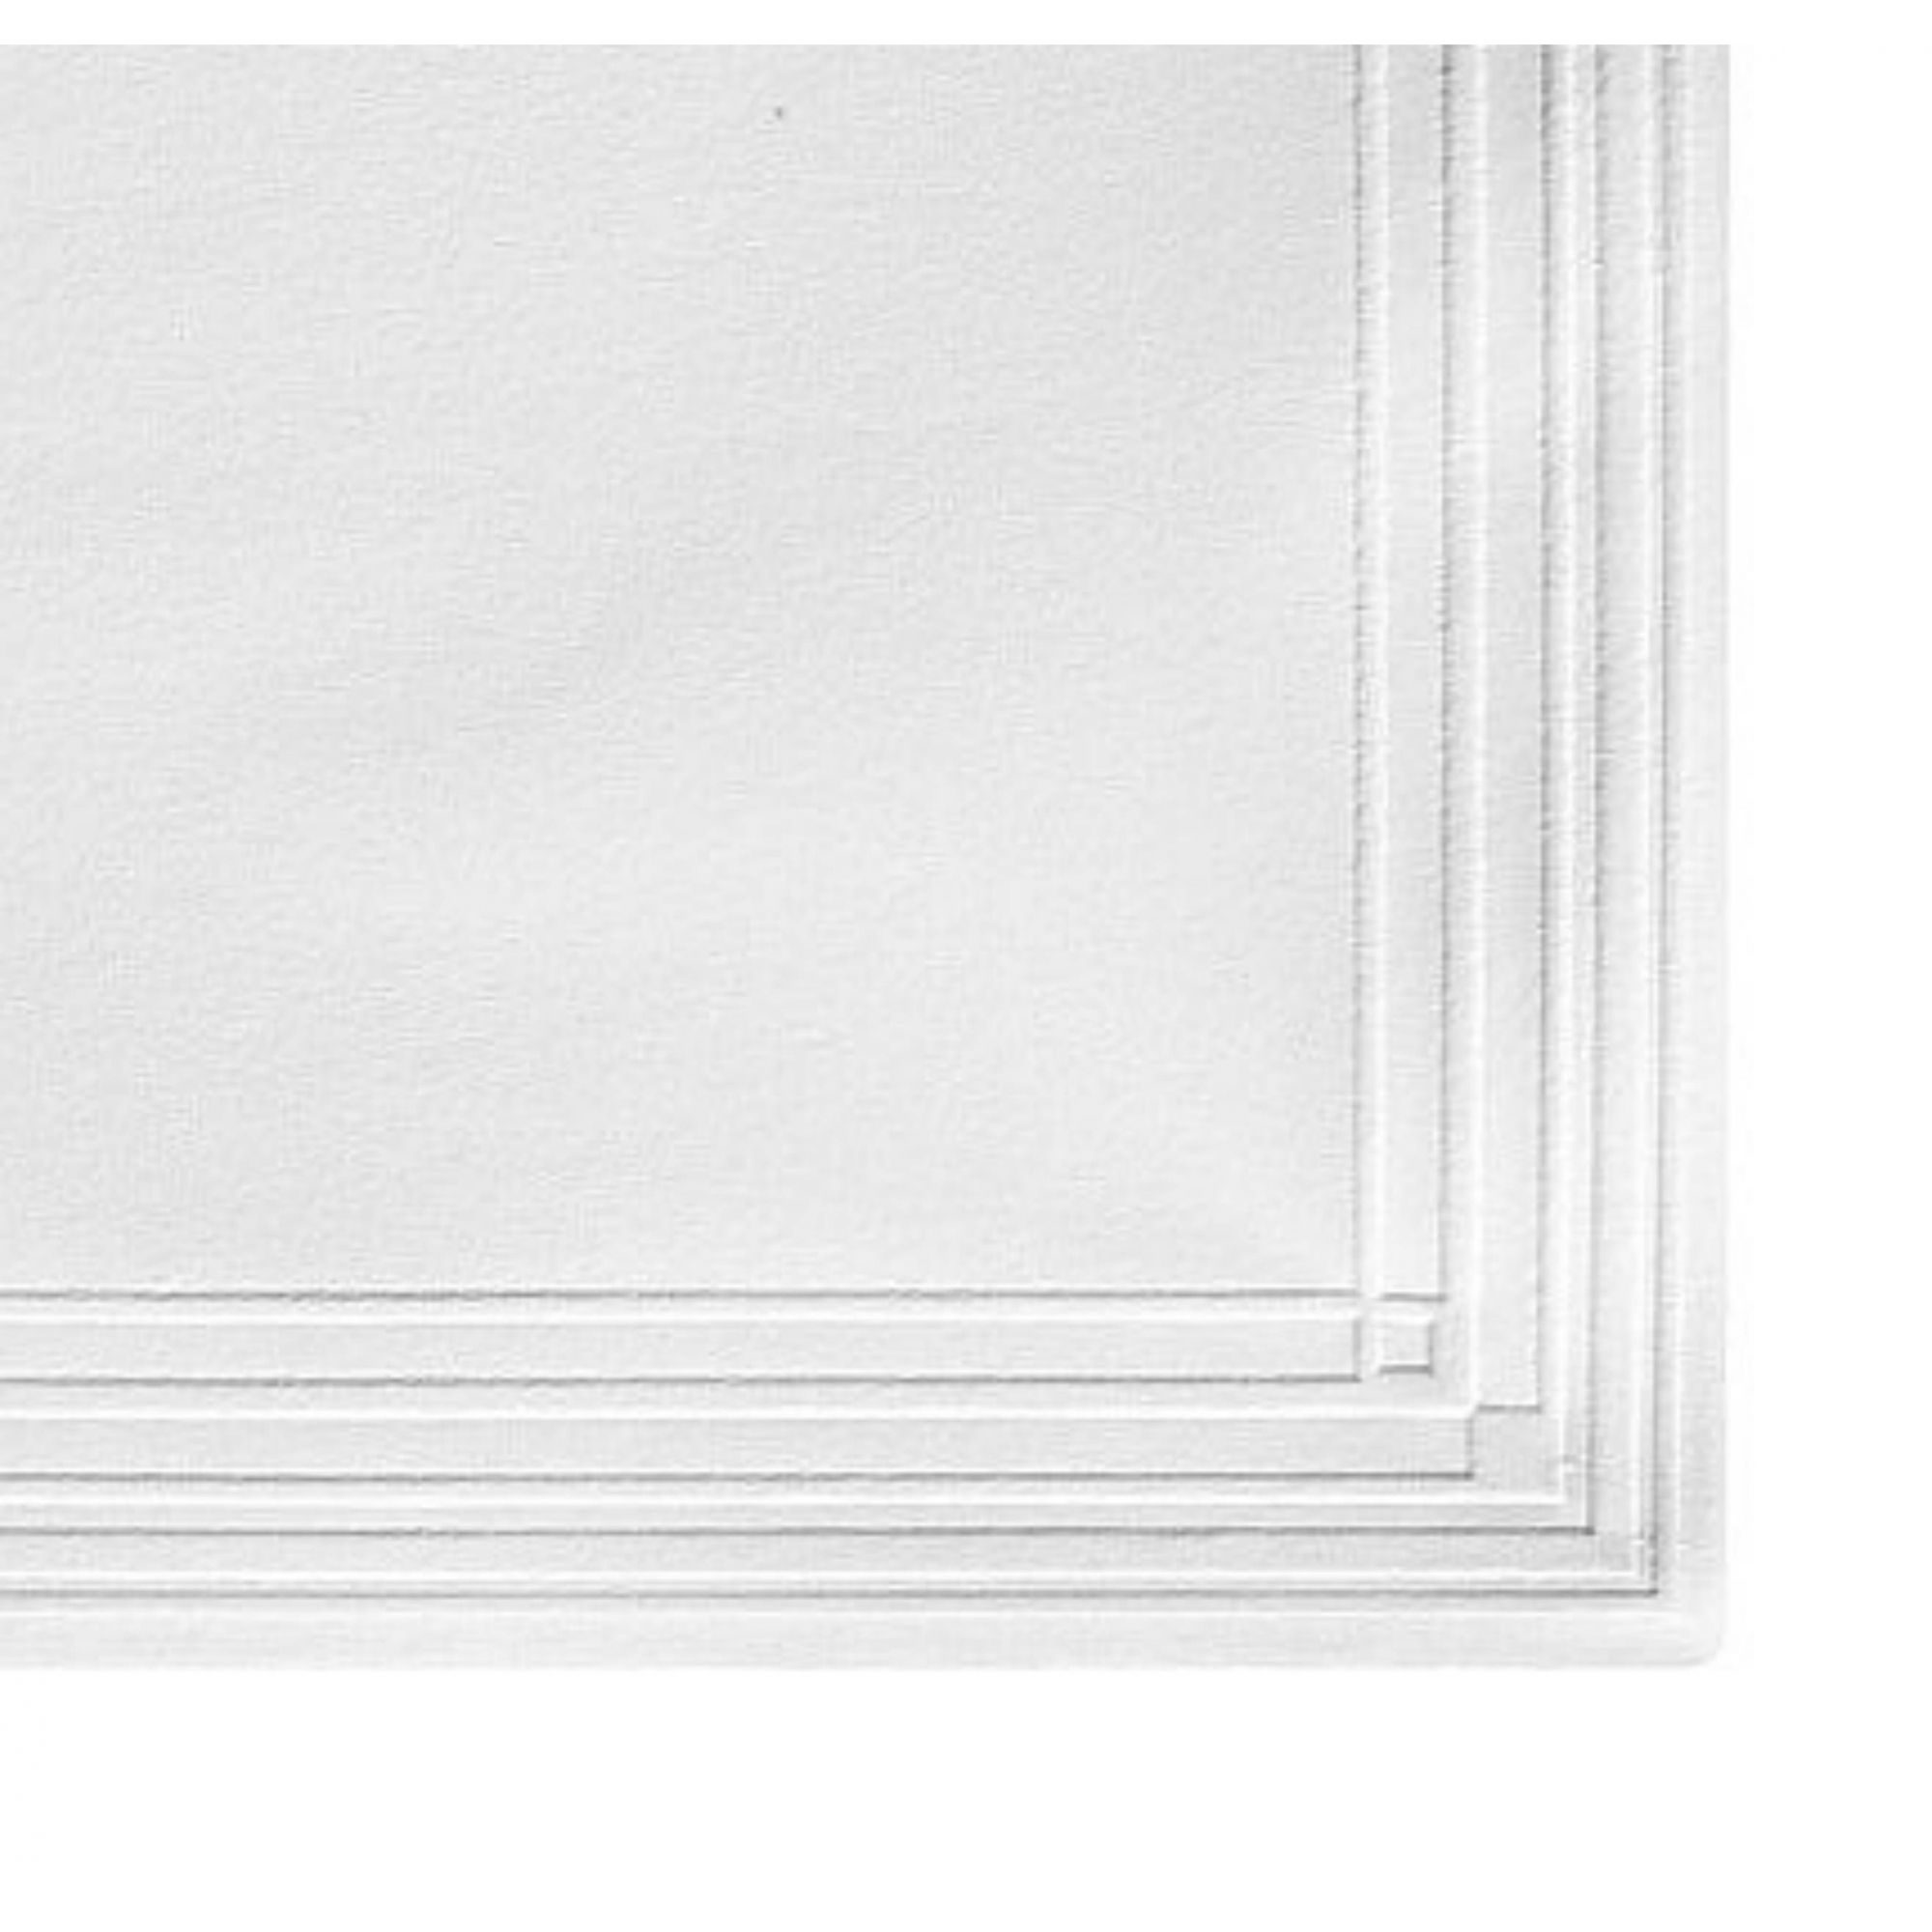 Guardanapo papel branco liso/Clássico 24x24 - 100 unid  - Persona Guardanapos & Cia